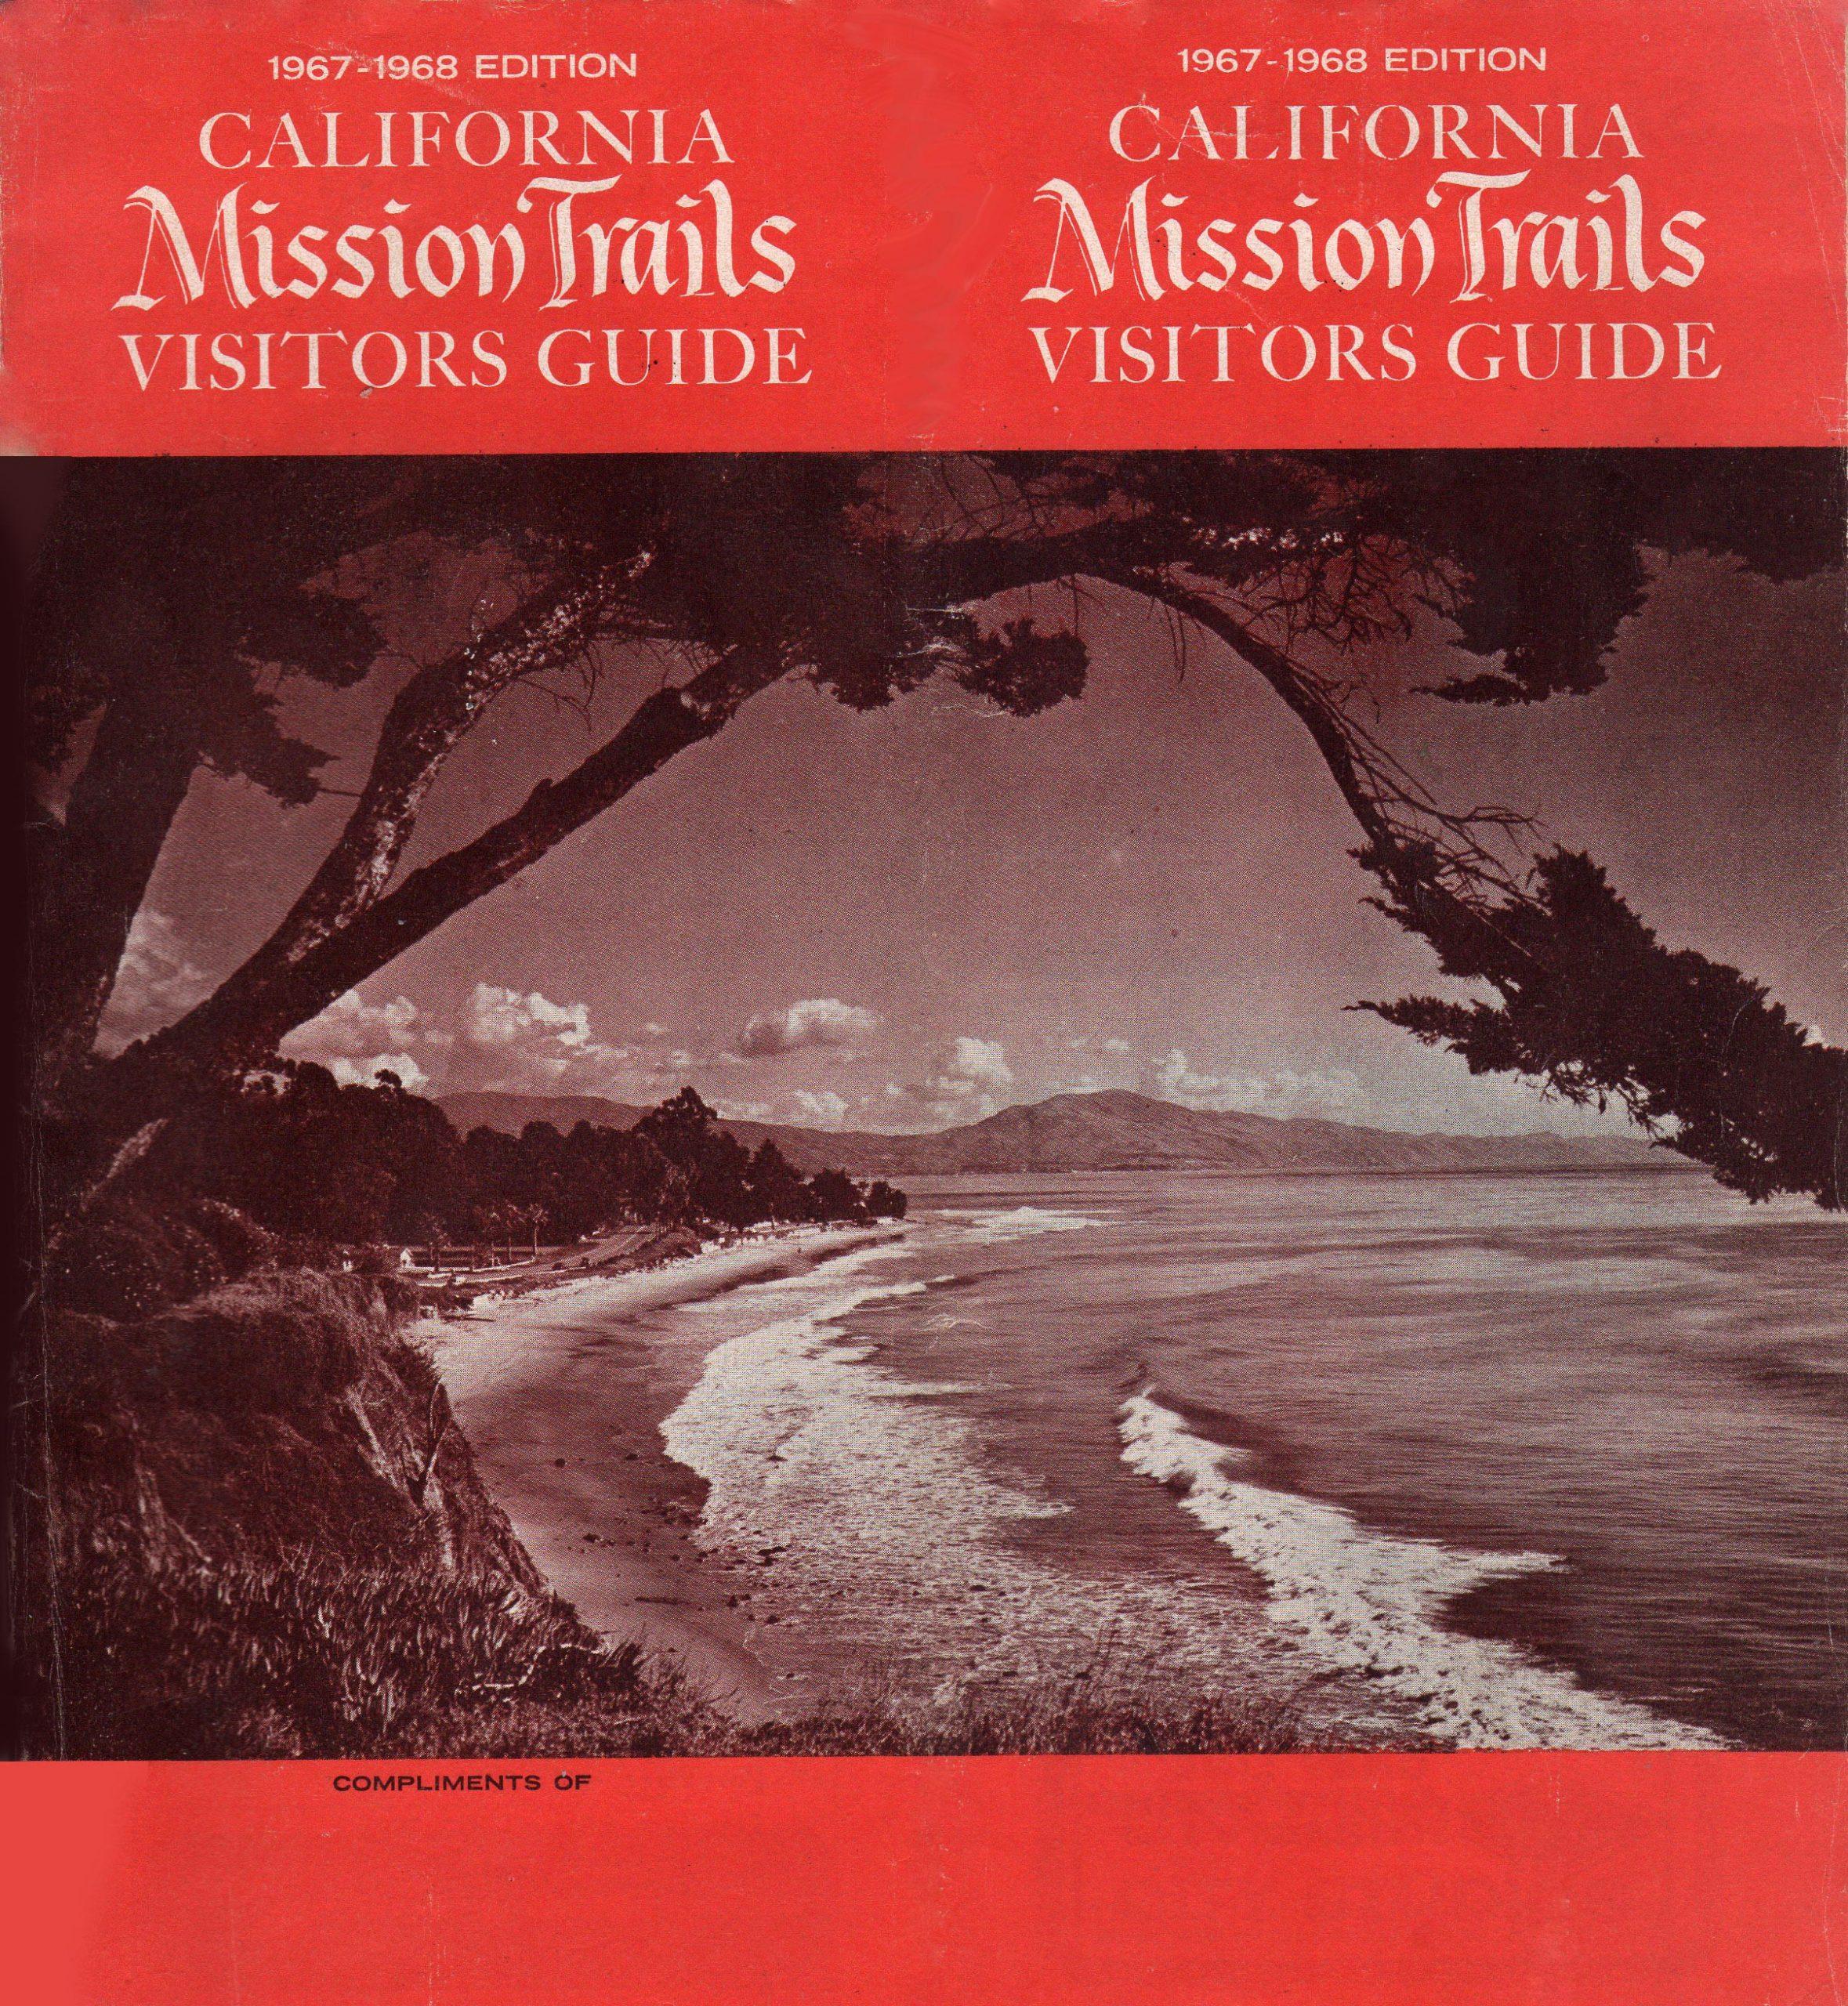 Mission Trails Visitors Guide 1967-1968